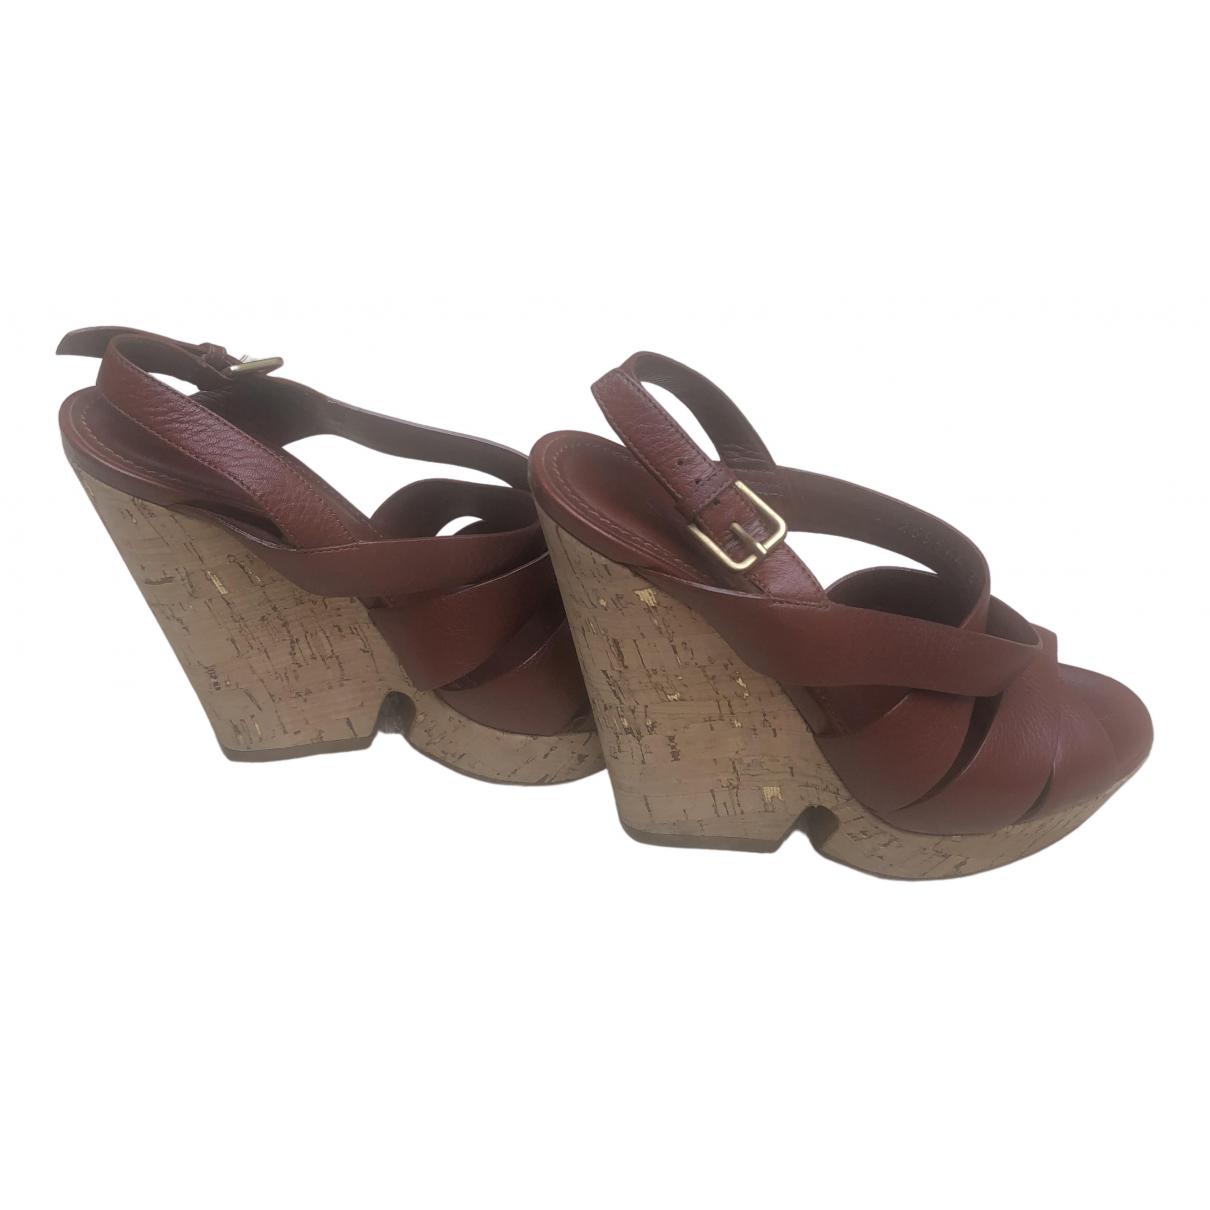 Yves Saint Laurent N Brown Leather Sandals for Women 37 EU